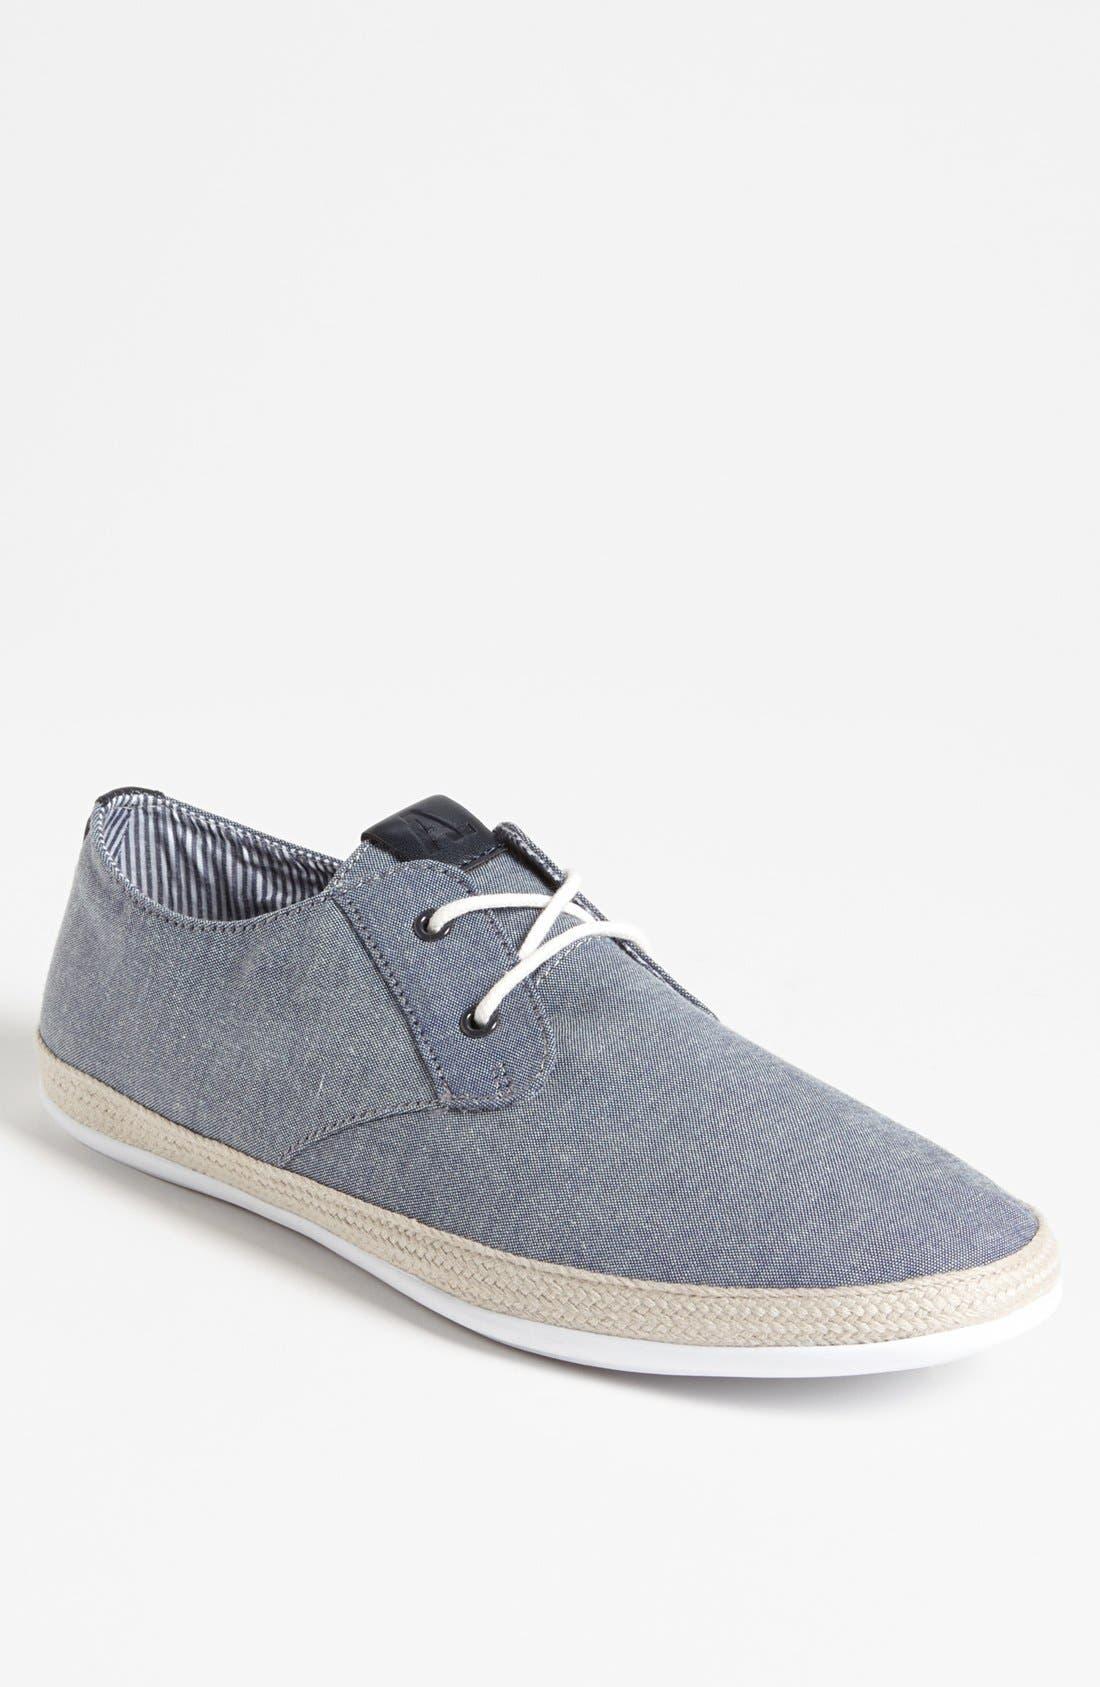 Main Image - ALDO 'Stein' Sneaker